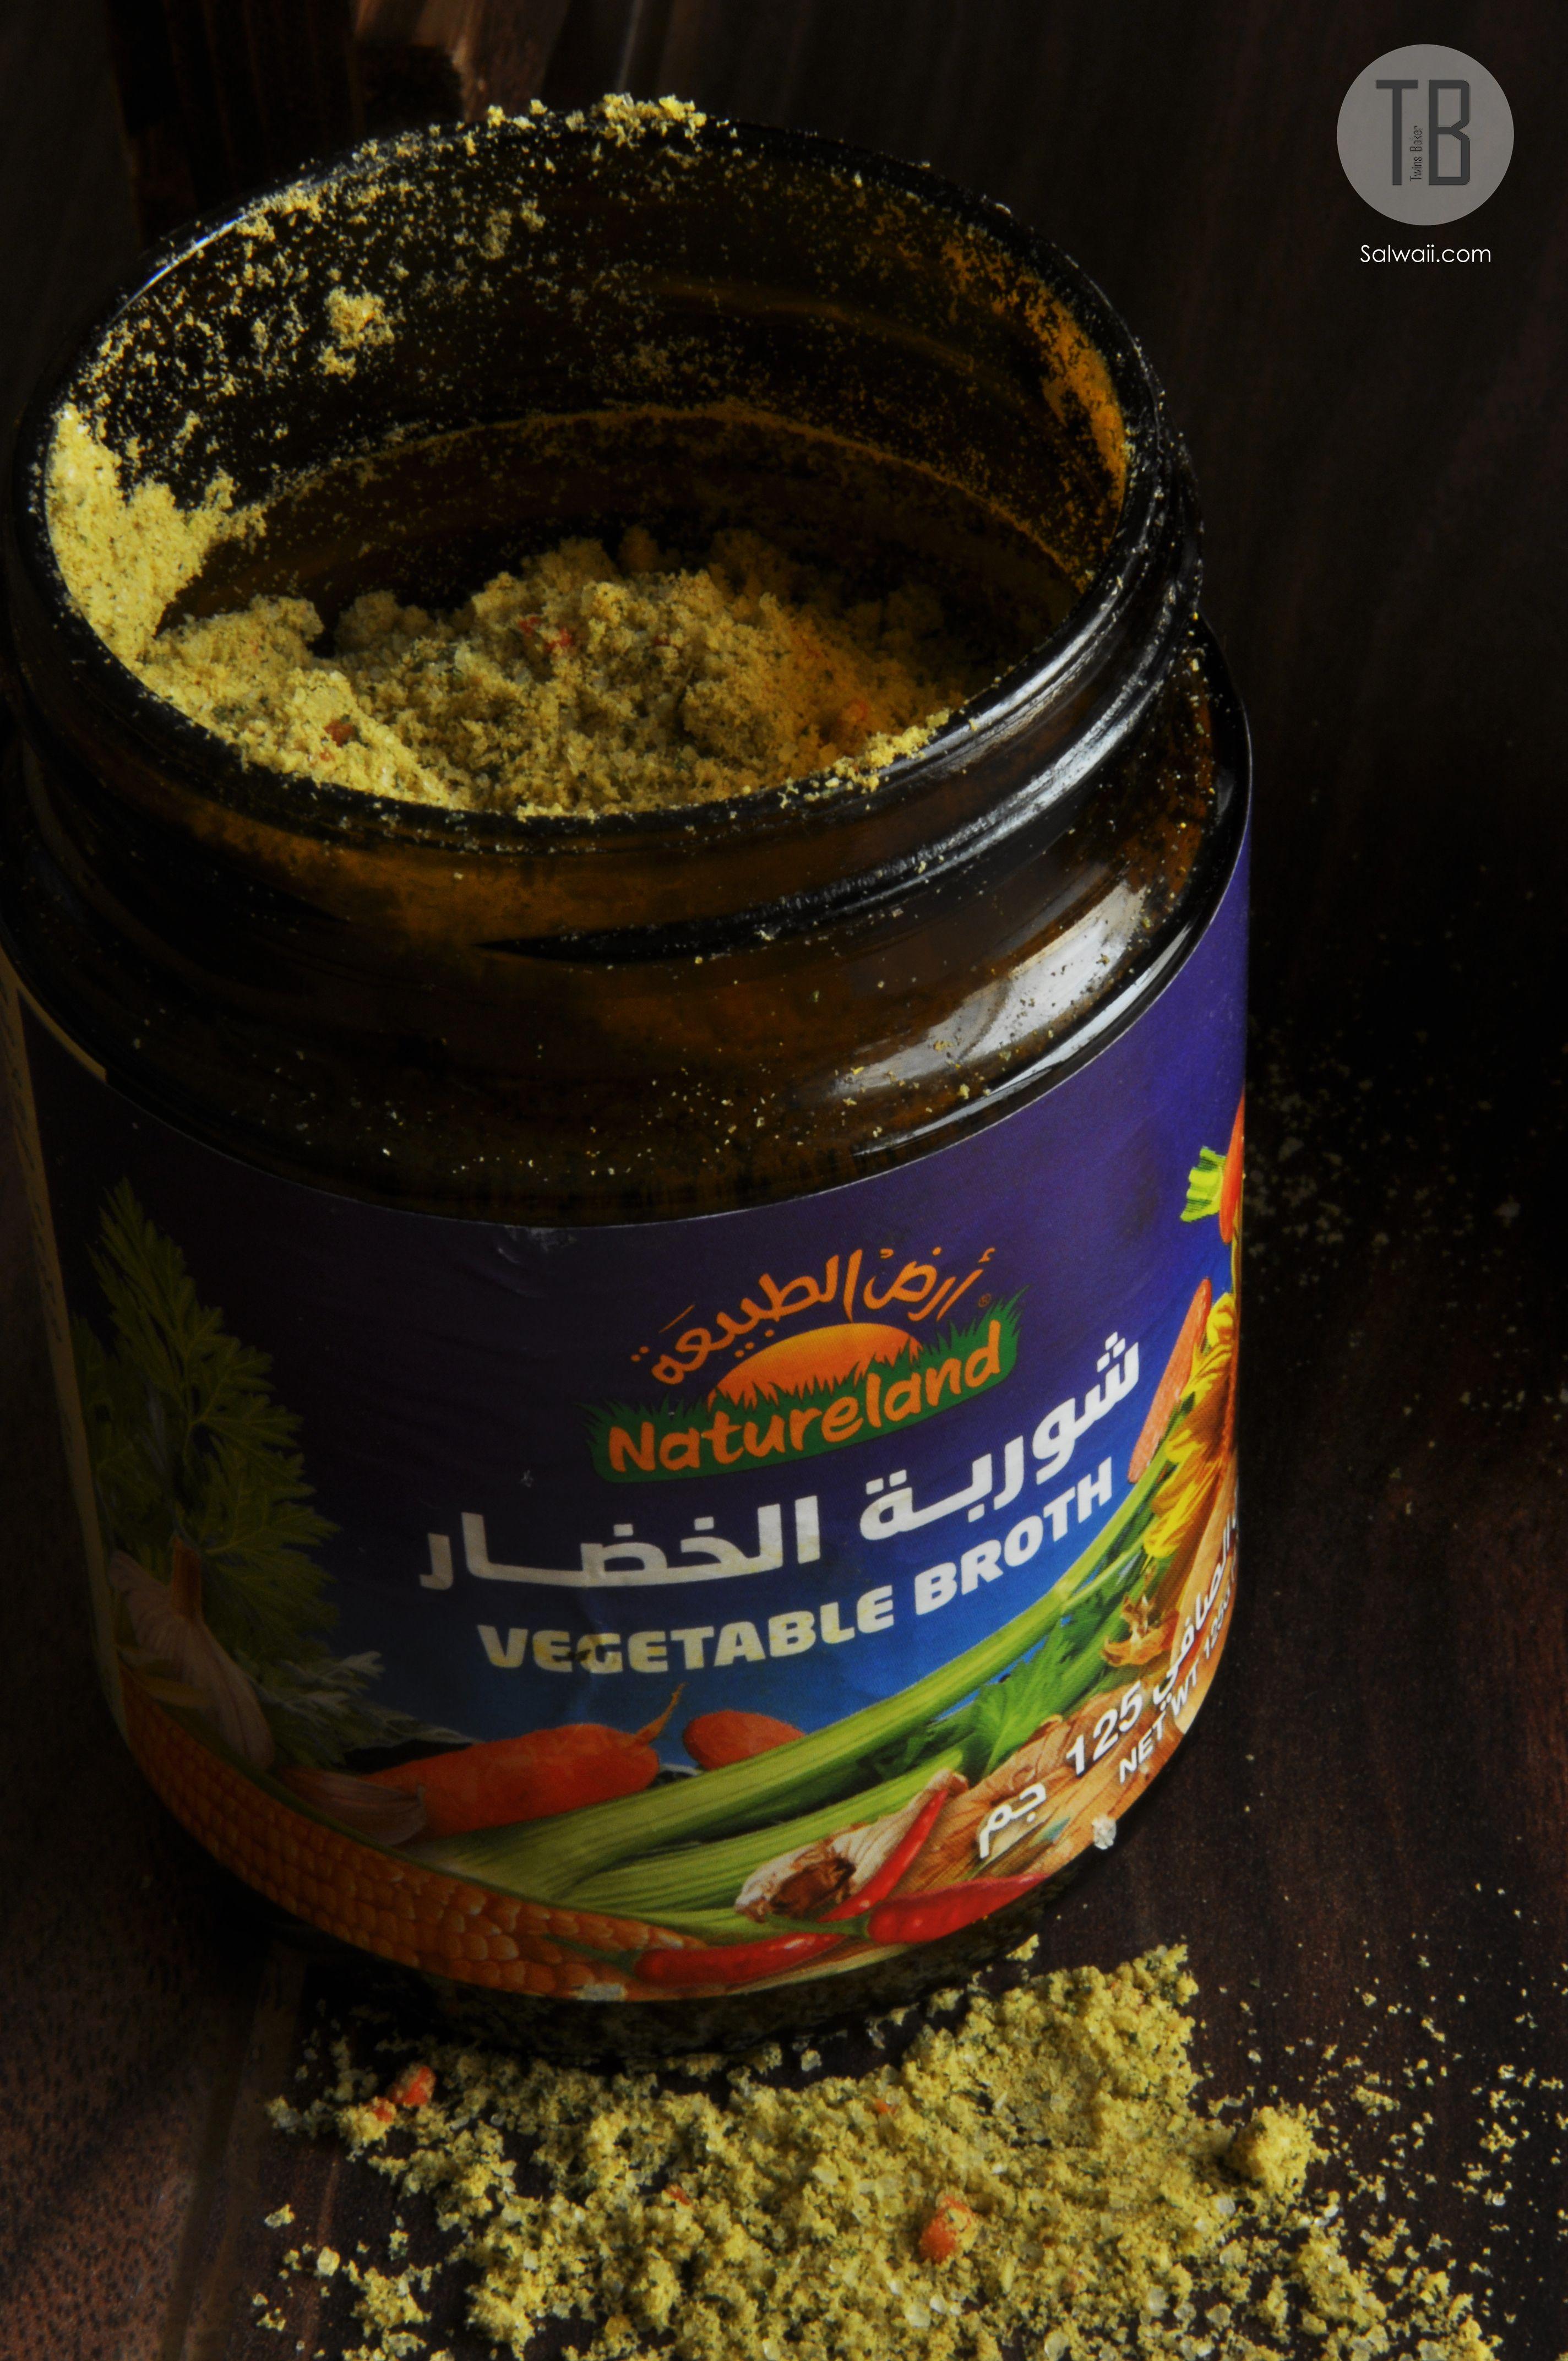 Vegetable Broth تجربة بديل الماجي شوربة الخضار من أرض الطبيعة Food Spices Coffee Cans